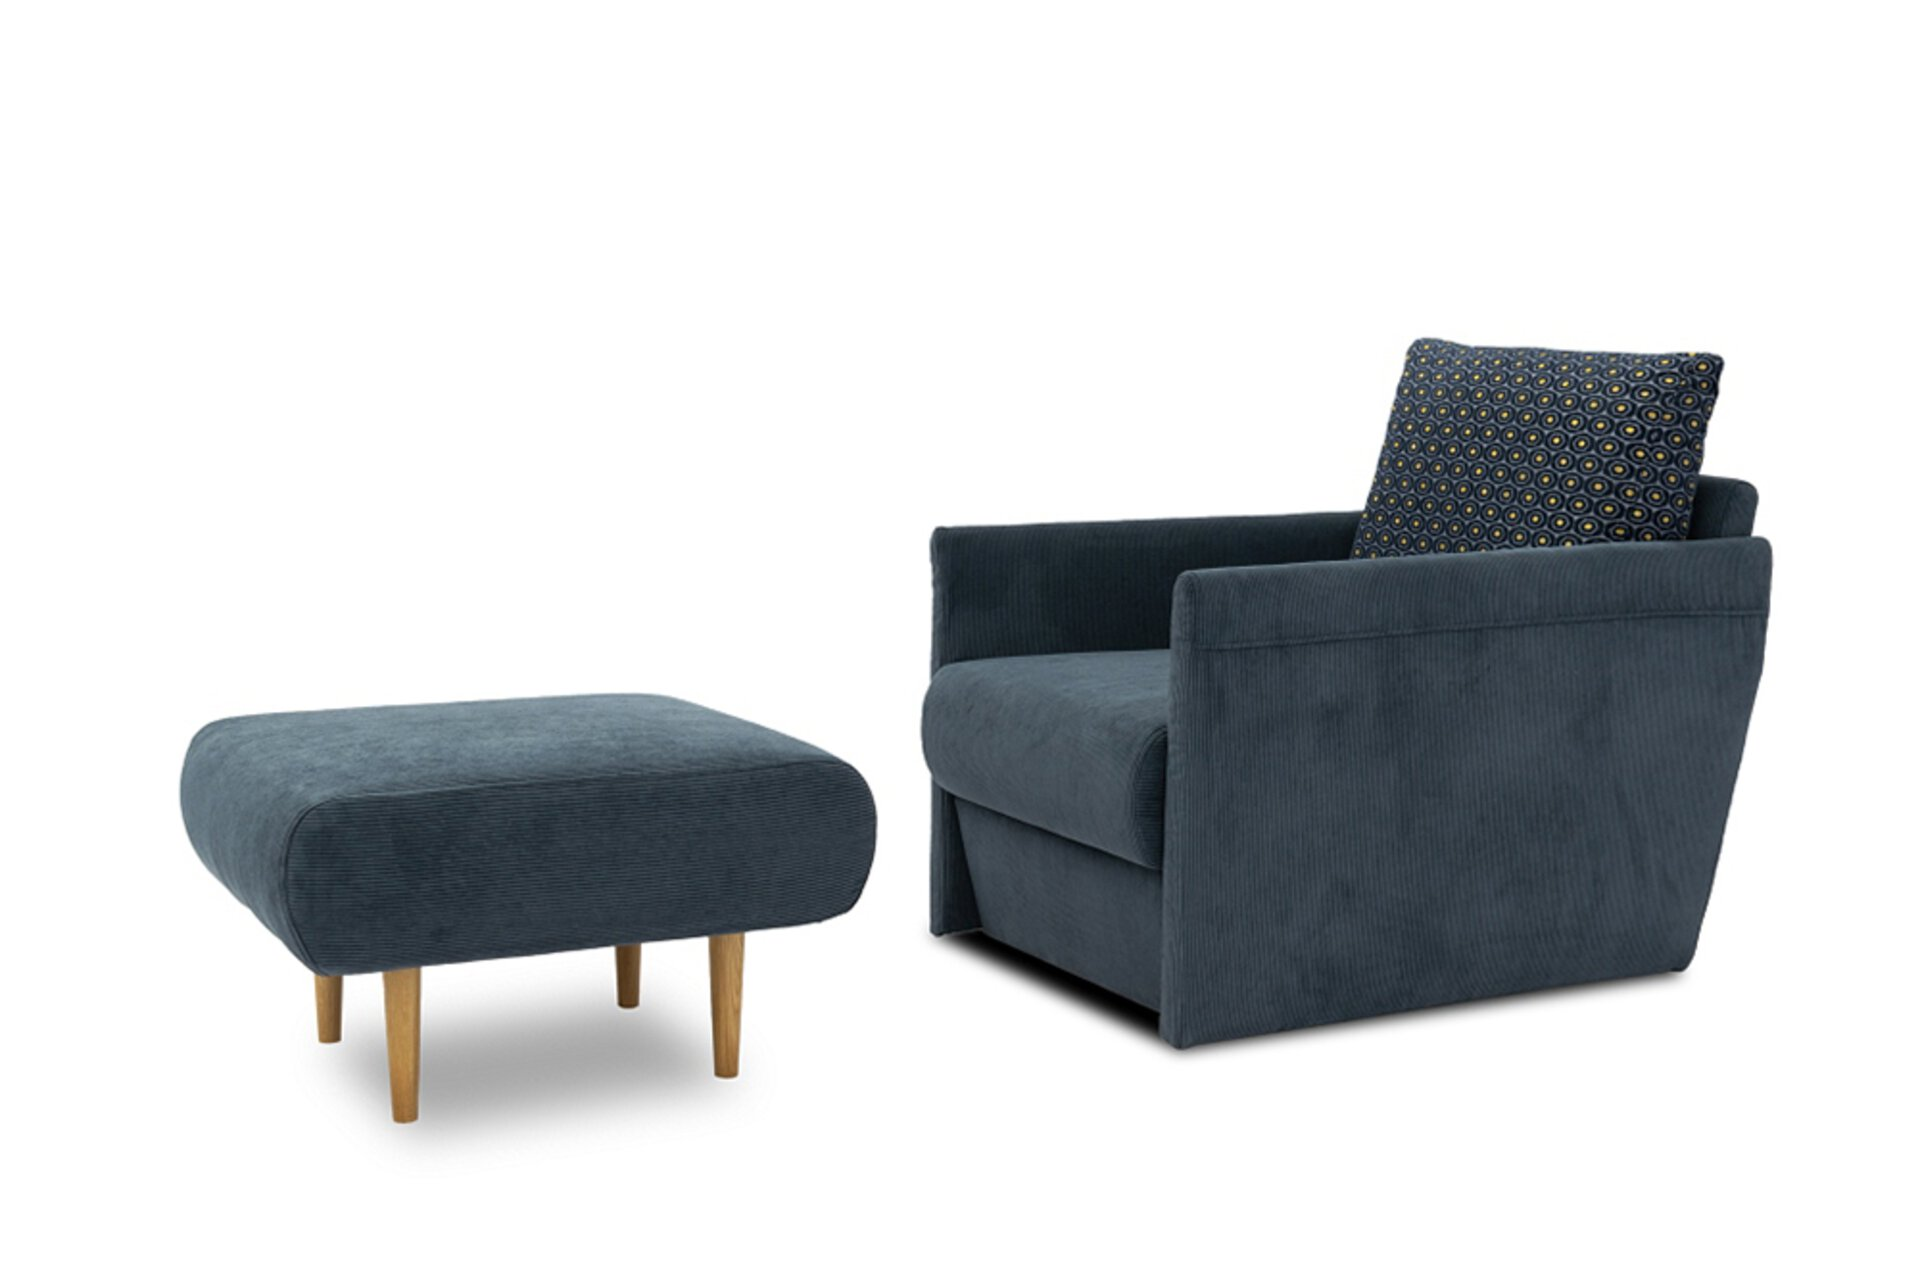 Sofa 1-Sitzer FOXTROT tiny.collection Textil 107 x 96 x 70 cm